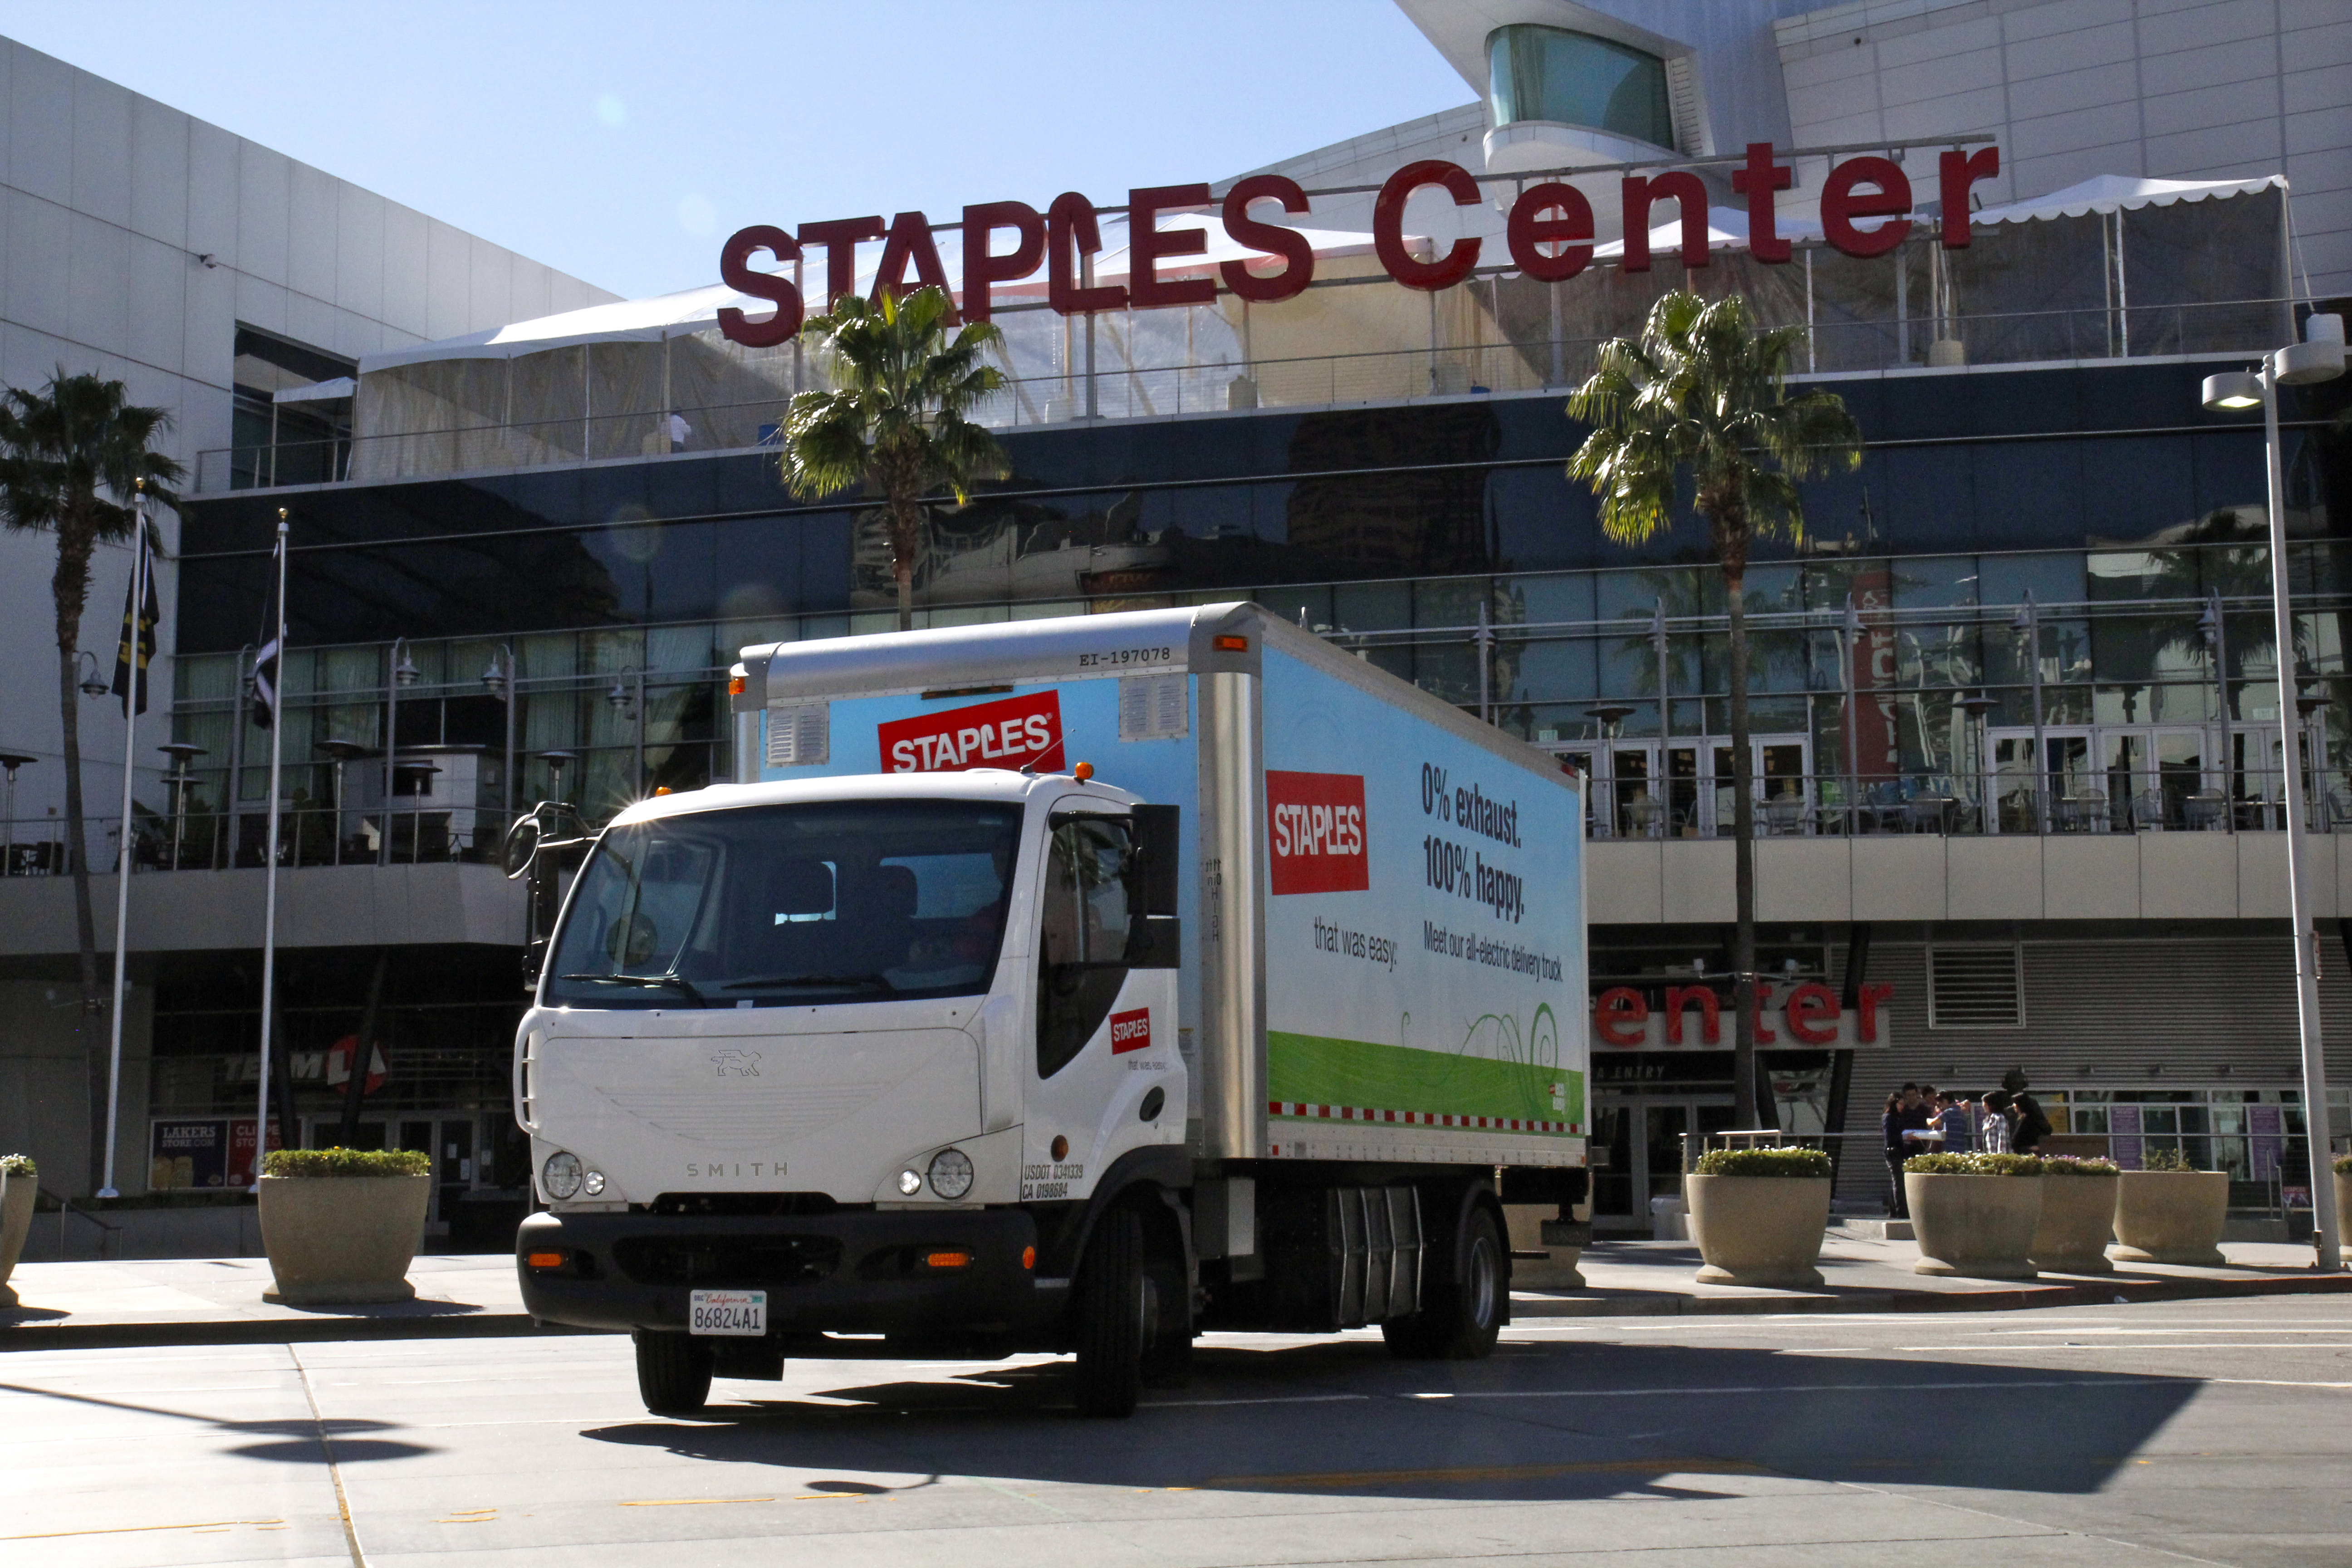 Staples Runs Electric Trucks in its Fleet